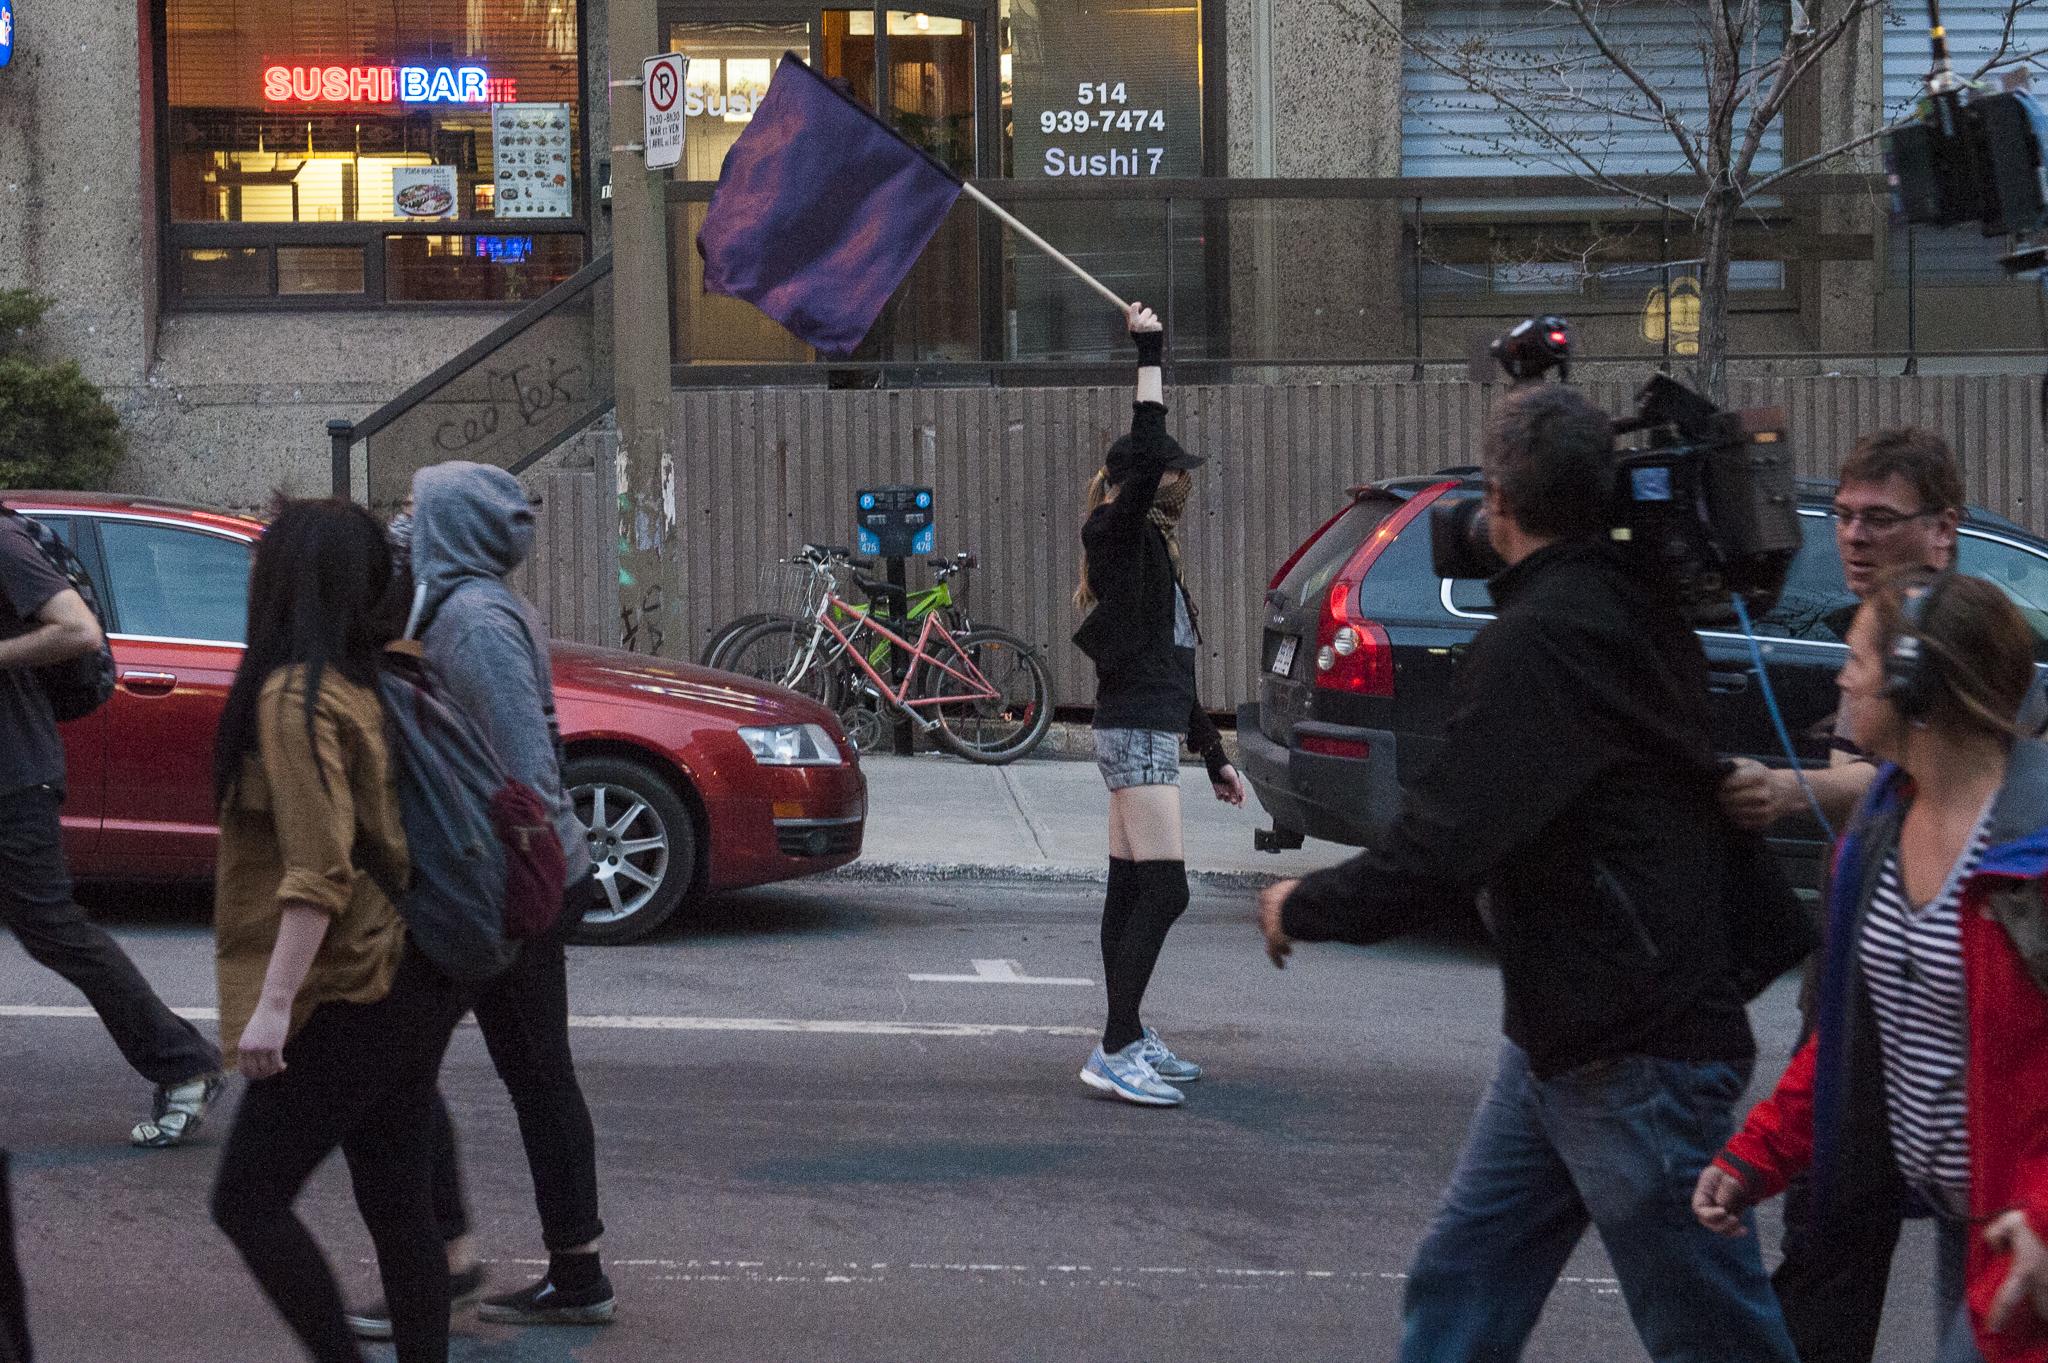 A masked protester waves a black flag on St-Mathieu St. - A.I.